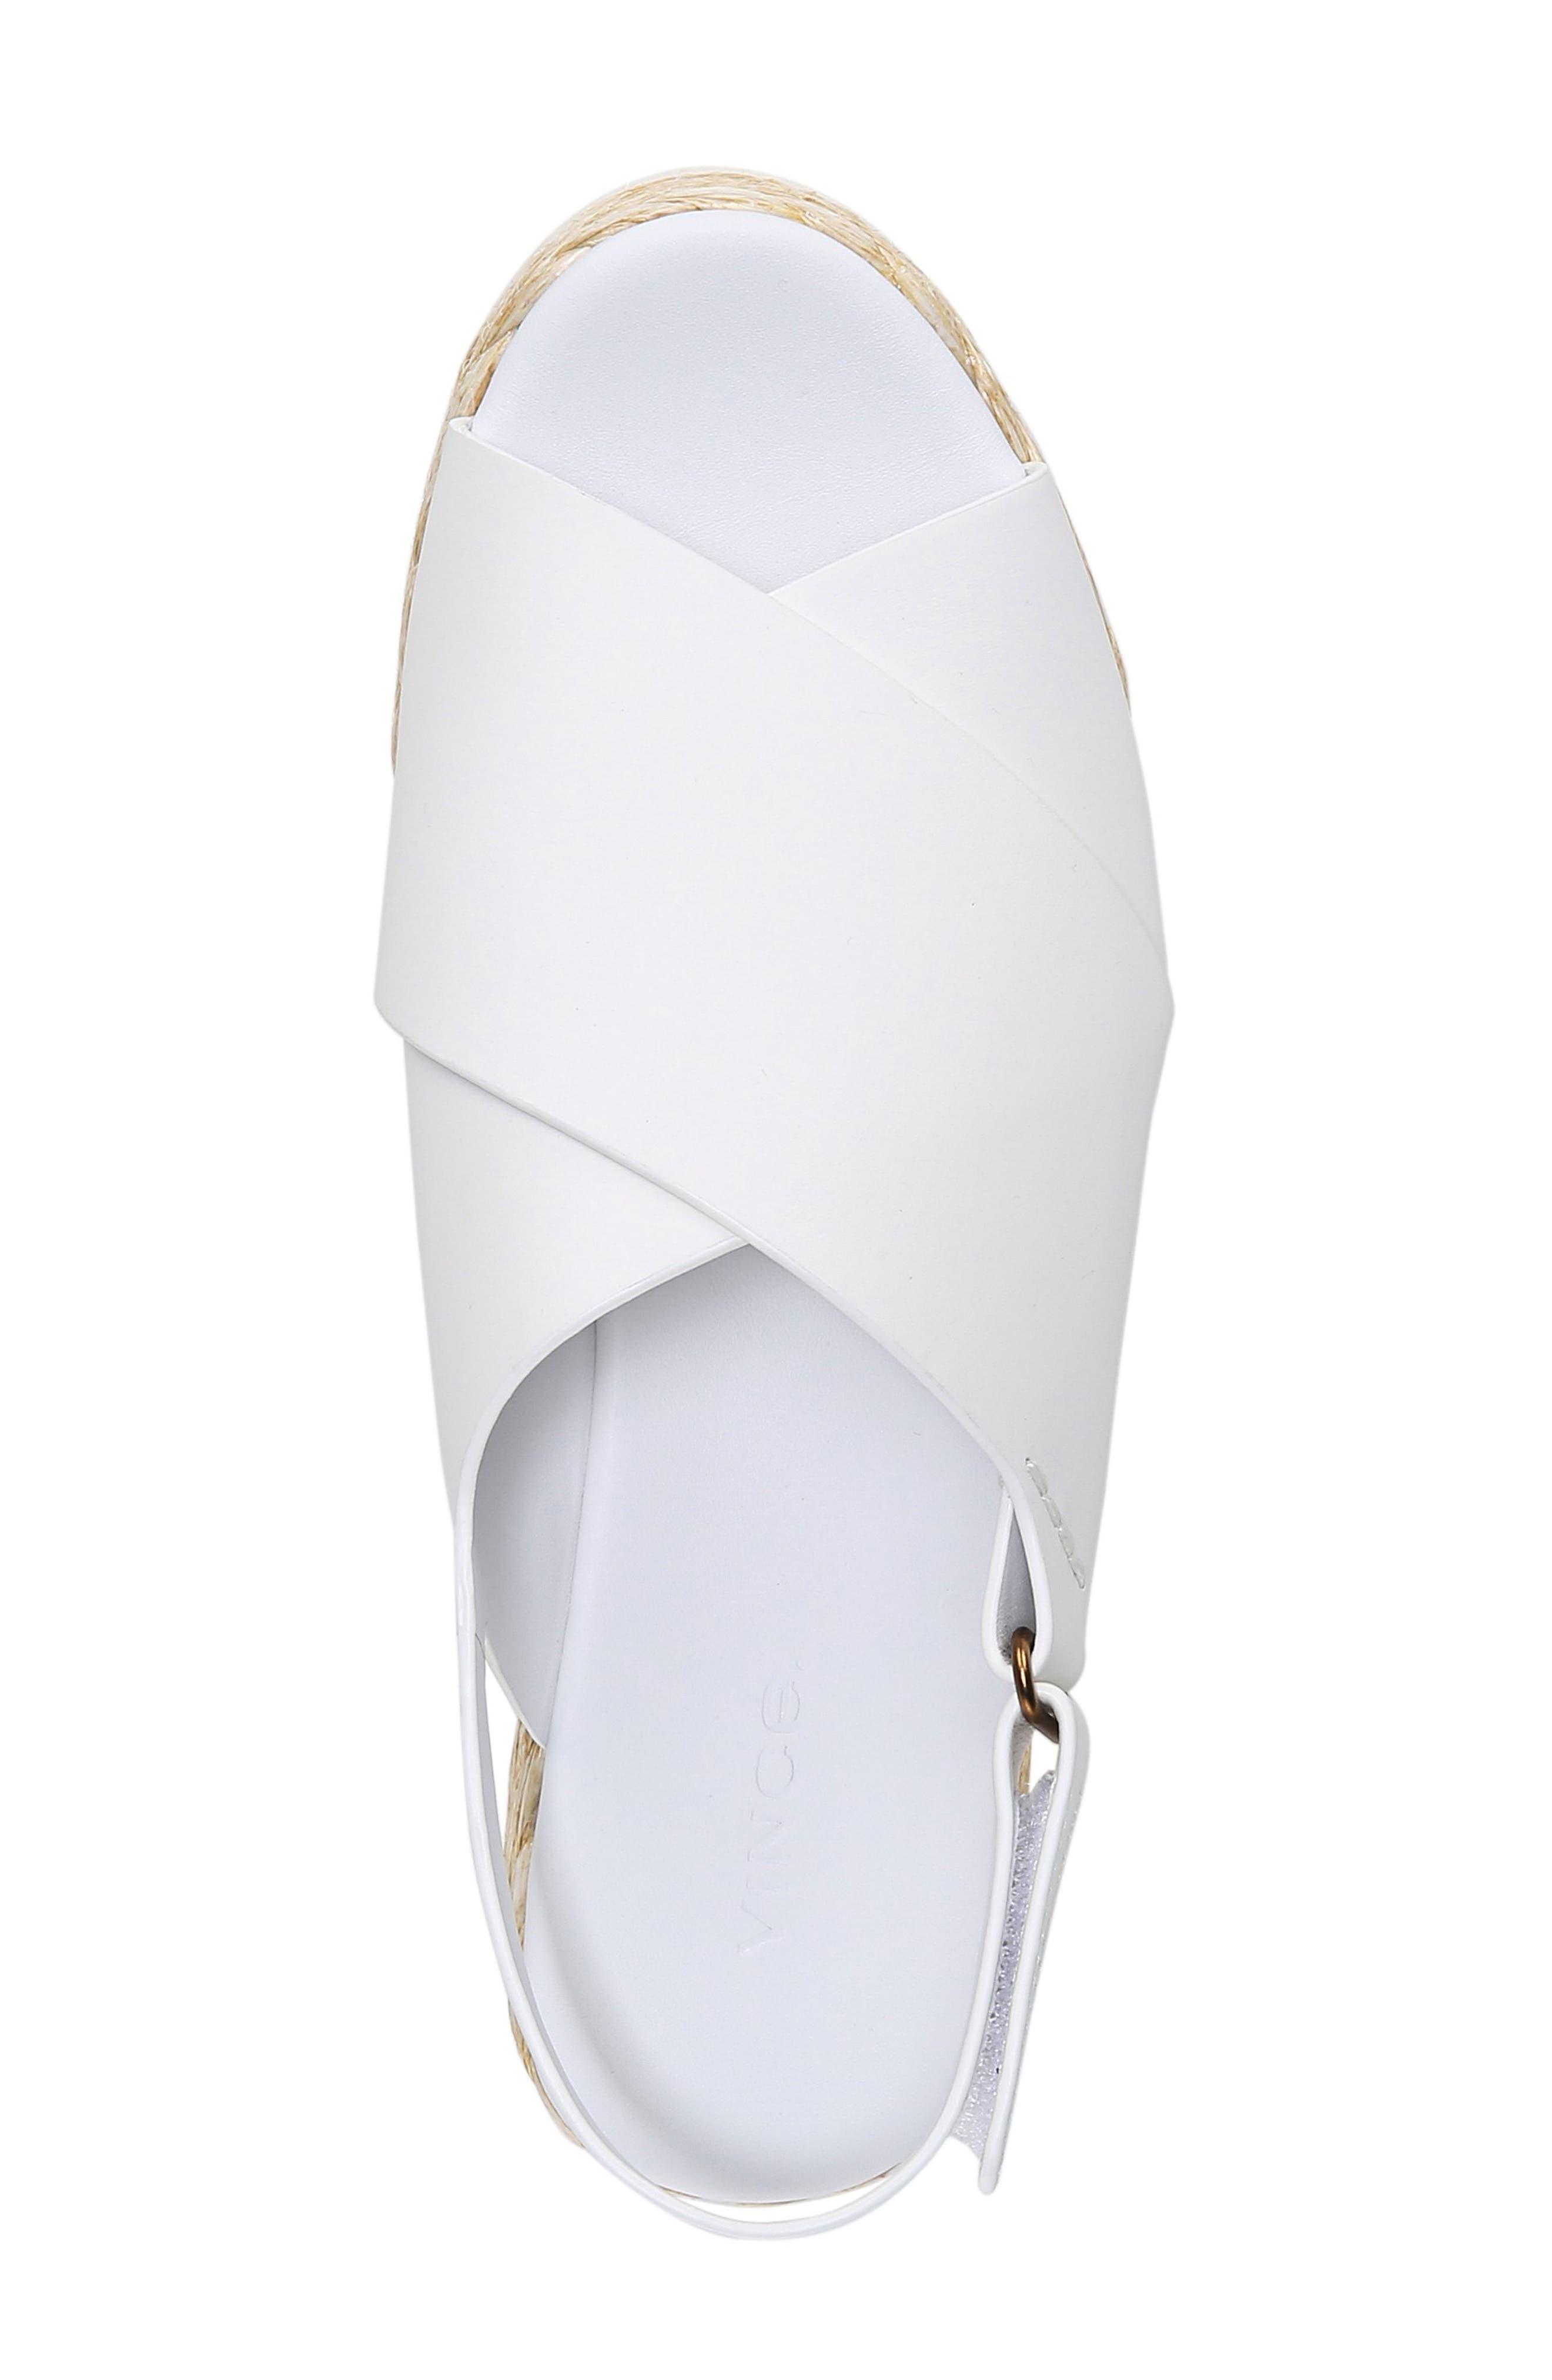 VINCE, Jesson Espadrille Slingback Sandal, Alternate thumbnail 5, color, OFF WHITE